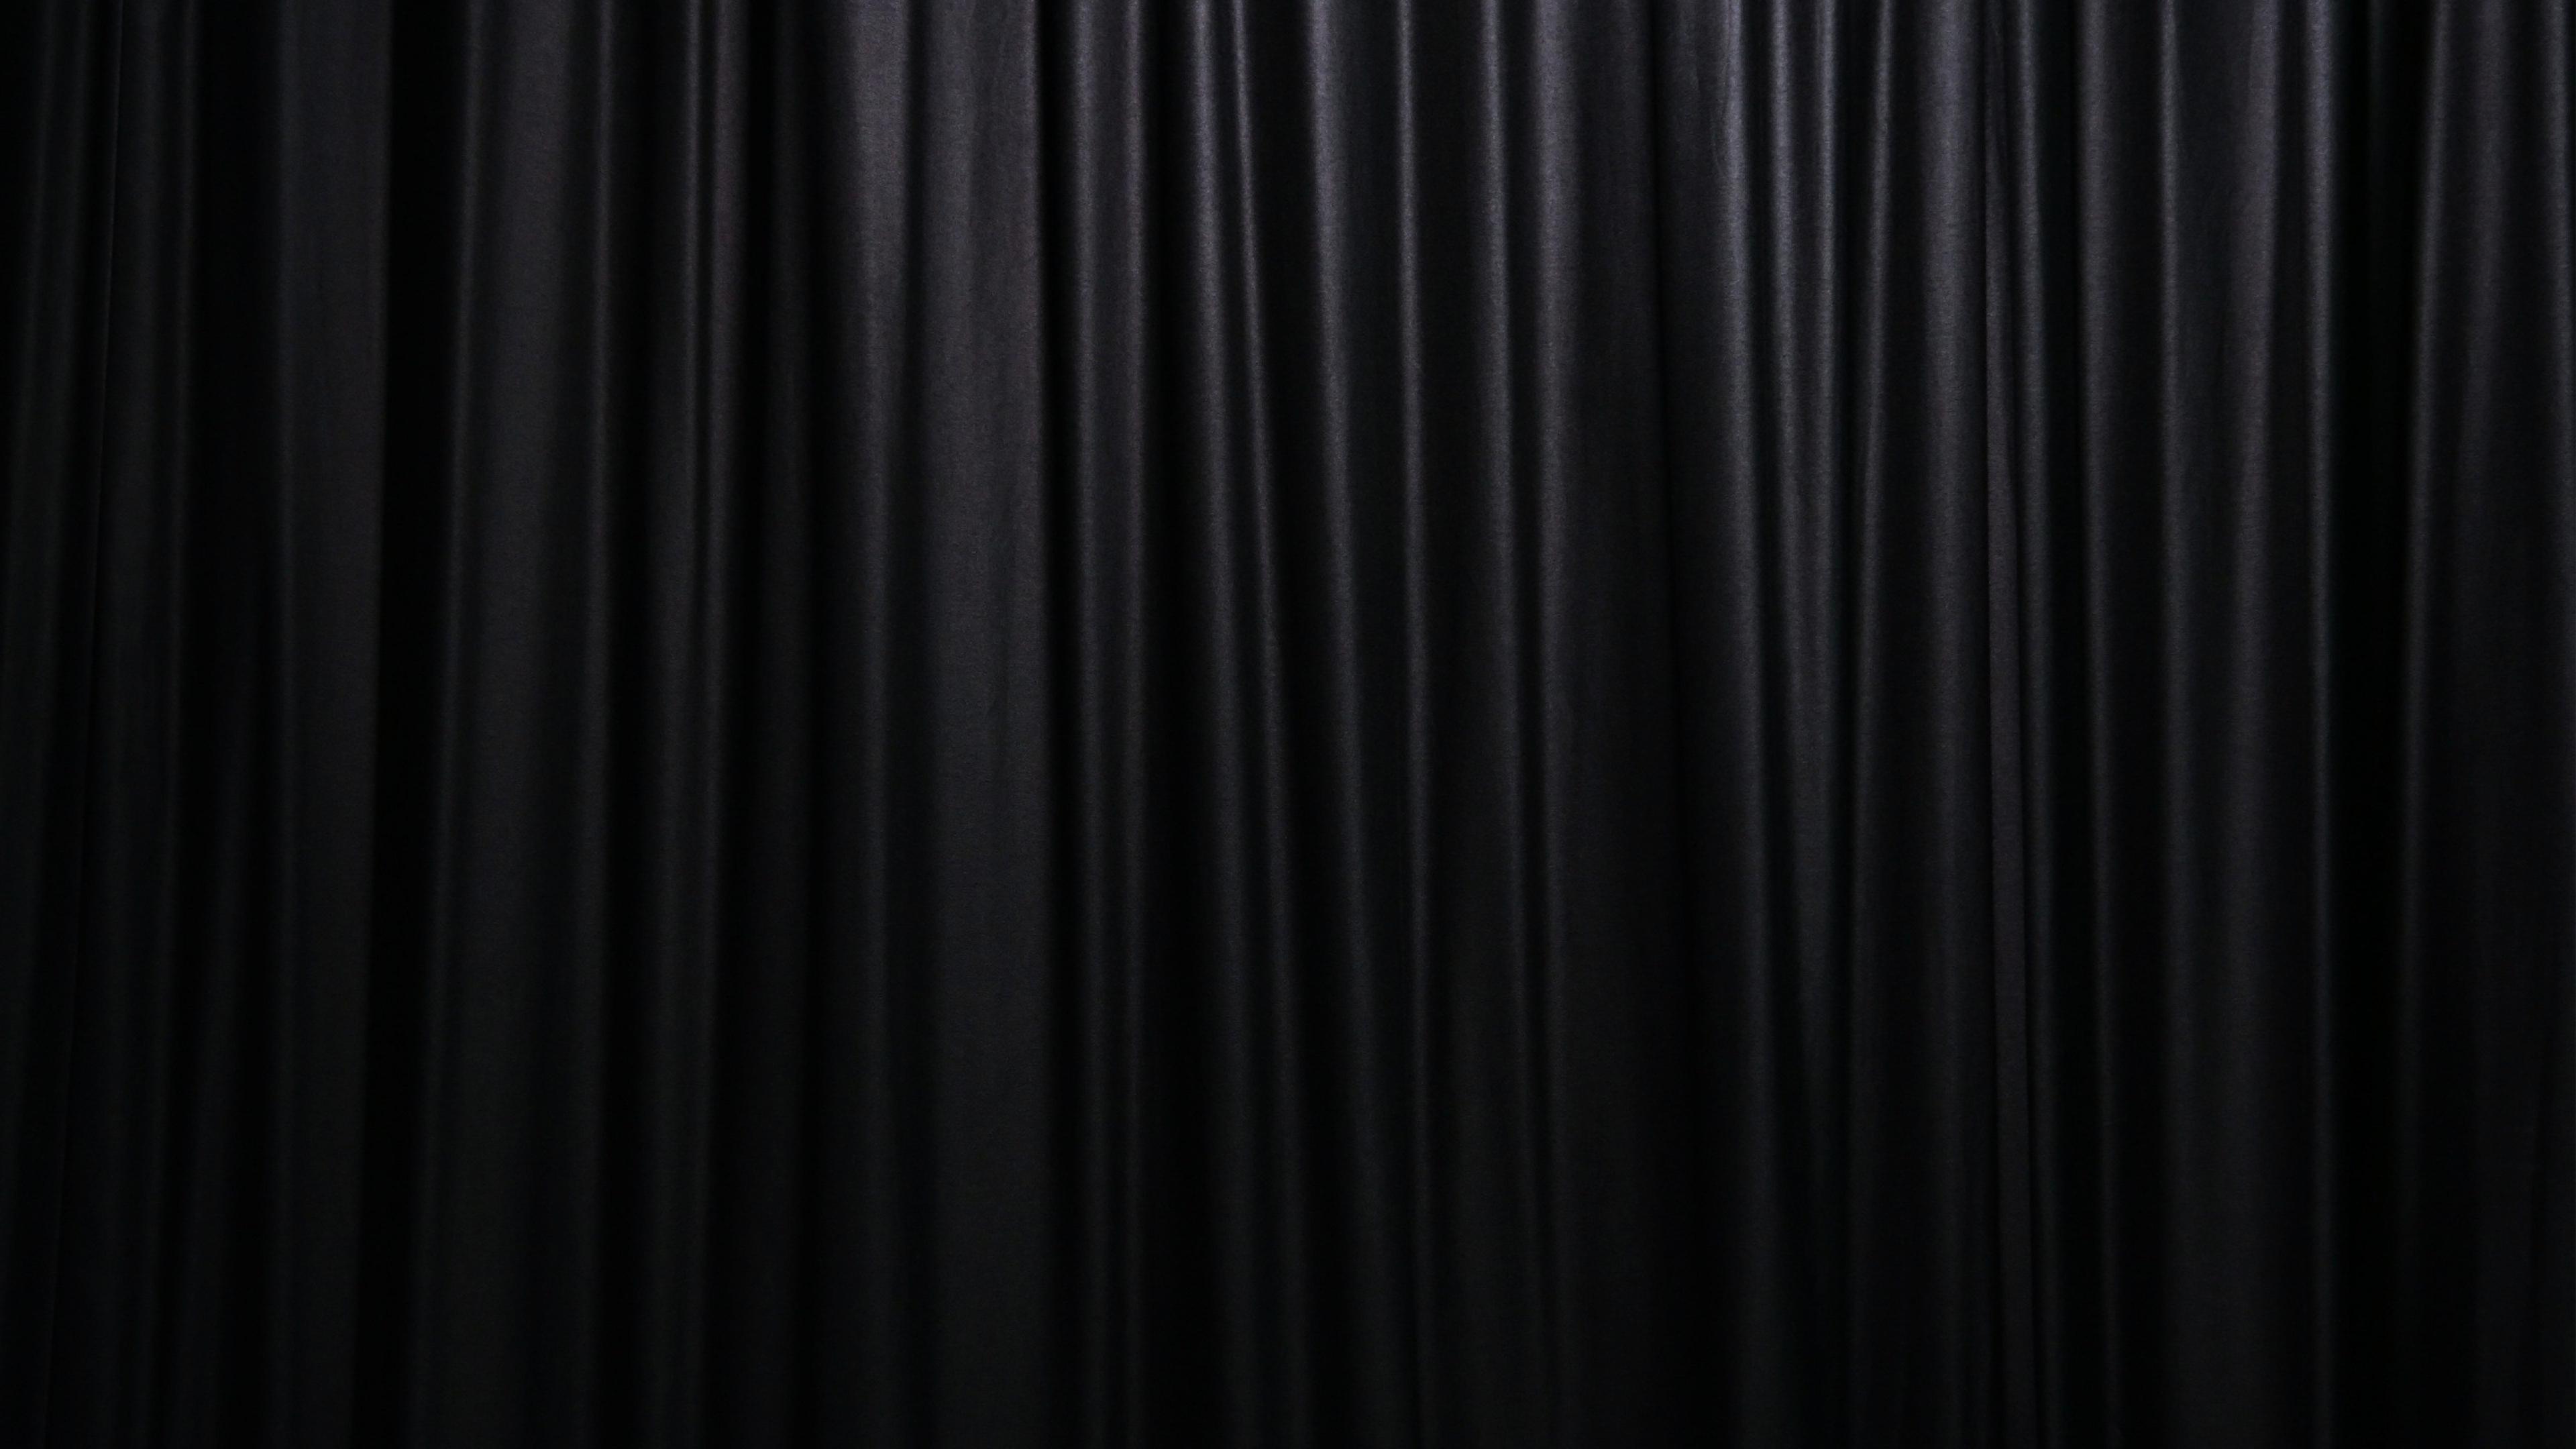 Black Ultra Hd Wallpapers Wallpaper Cave